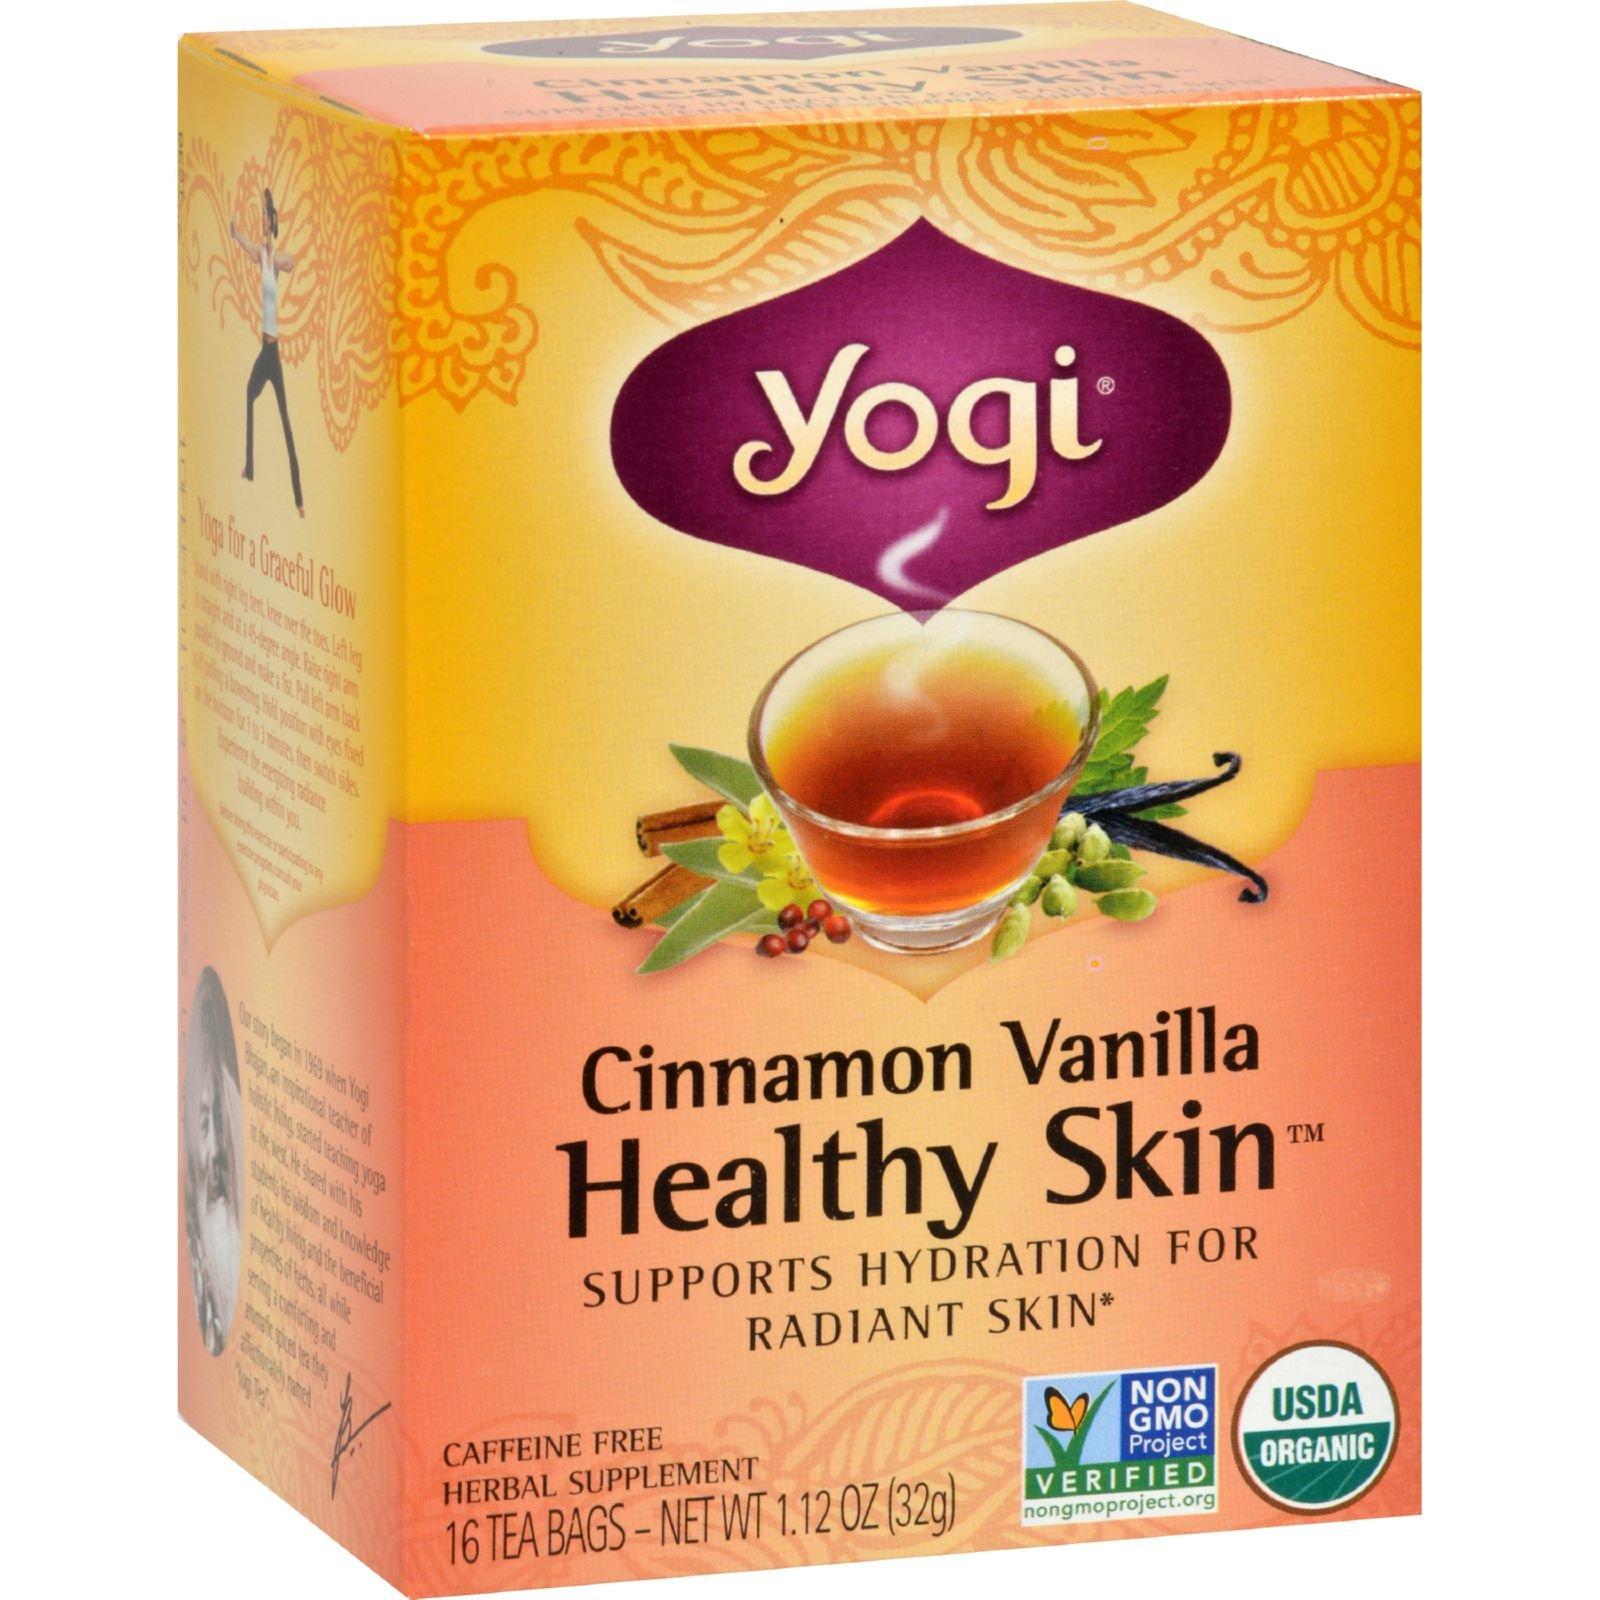 Yogi Teas Cinnamon Vanilla Healthy Skin Tea - 16 Tea Bags - Case of 6 by Yogi